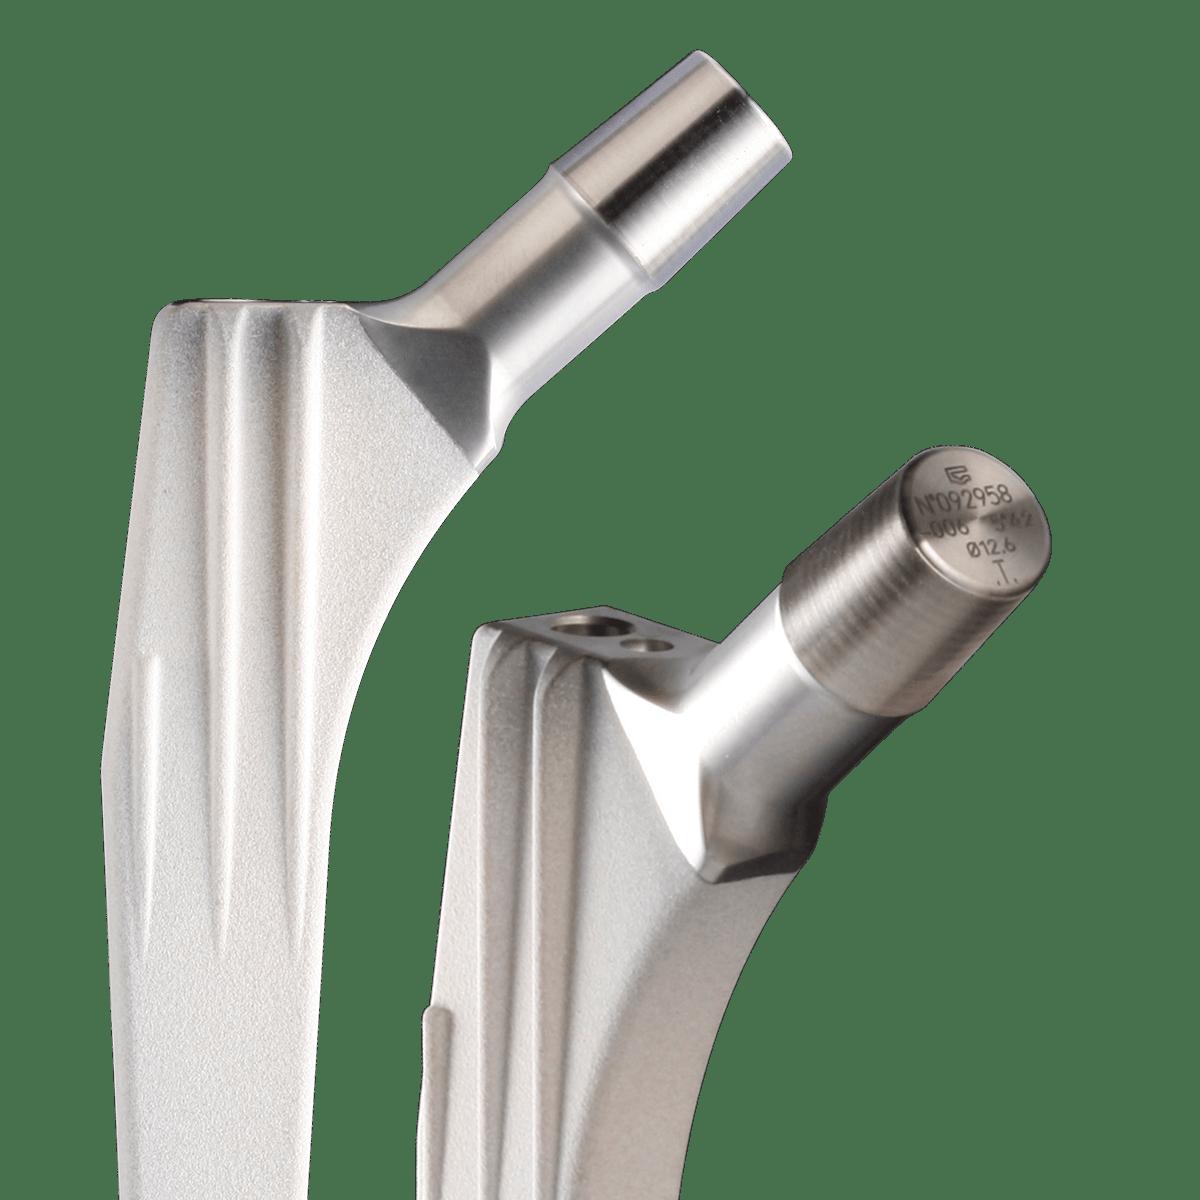 Hanche Tige Cerafit RMIS Standard